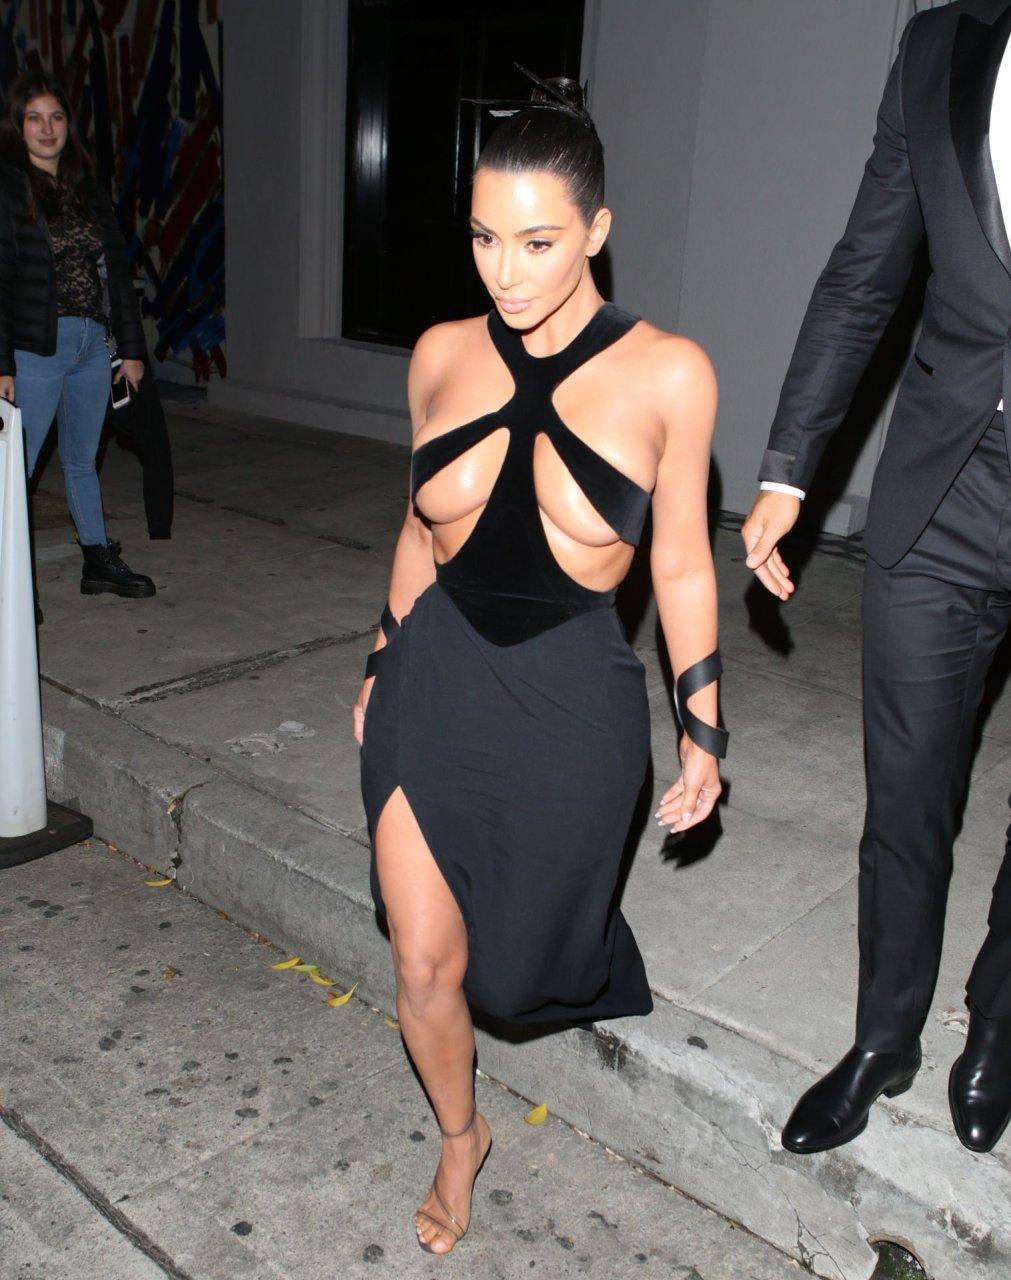 Kim-Kardashian-Topless-TheFappeningBlog.com-12.jpg